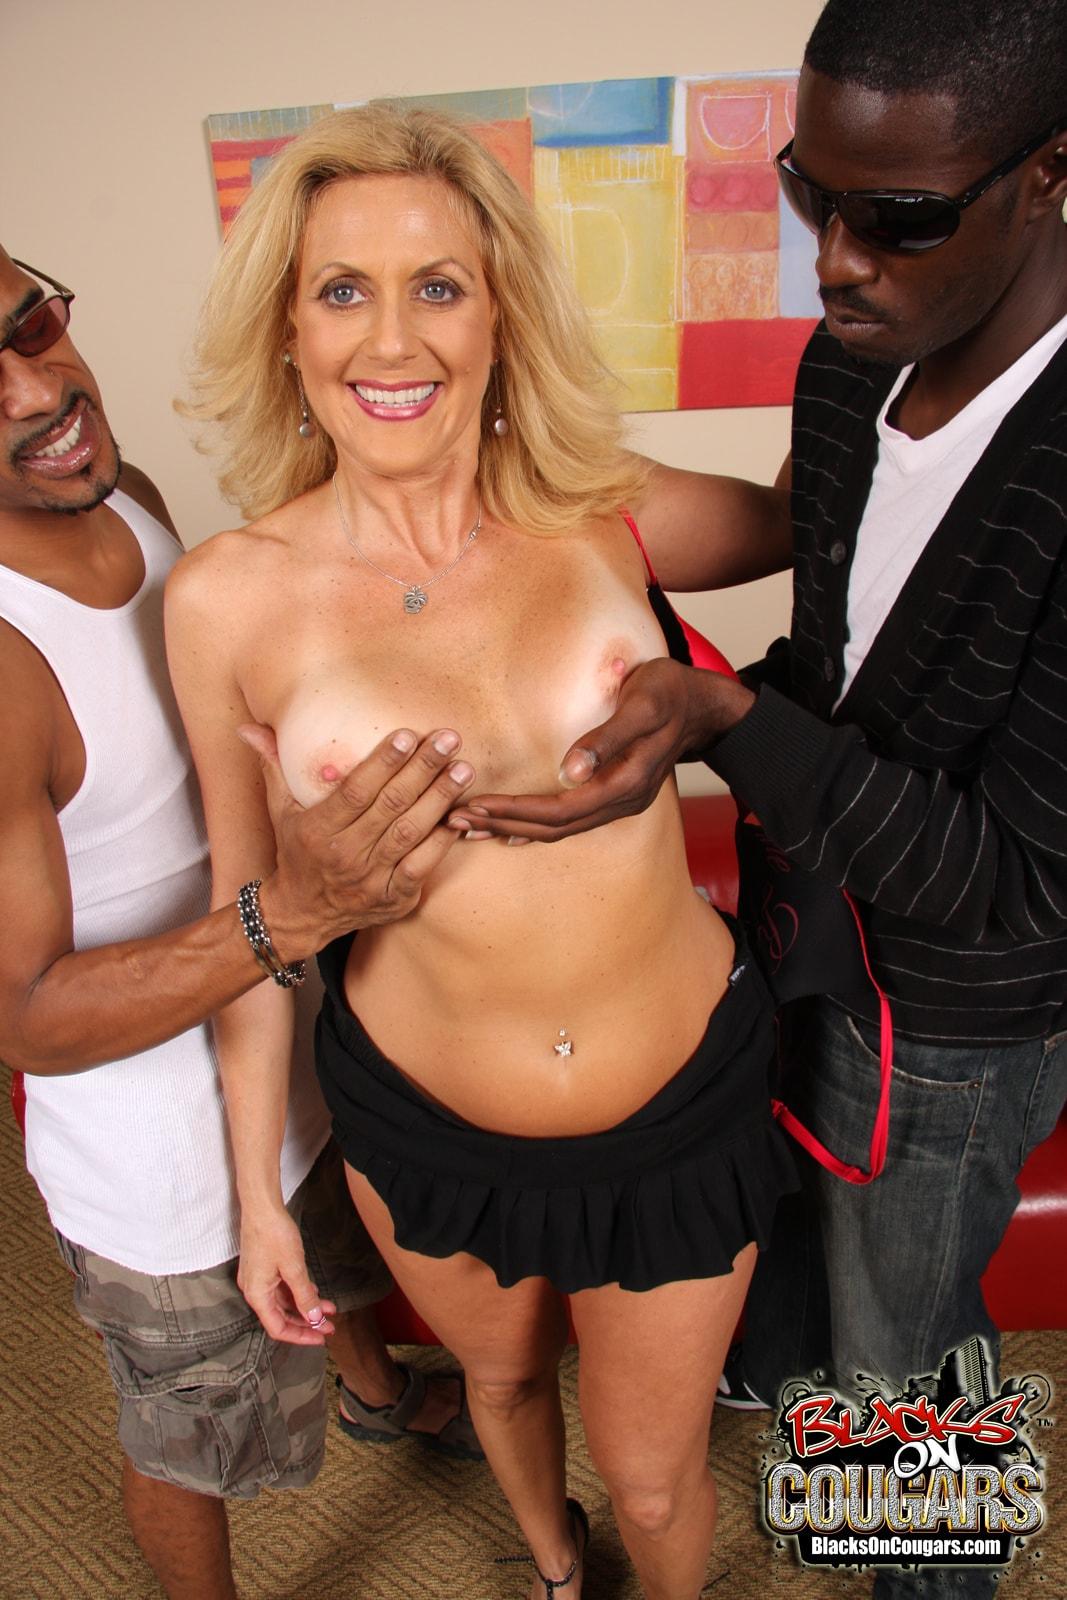 Dogfart '- Blacks On Cougars' starring Dana Devine (Photo 10)